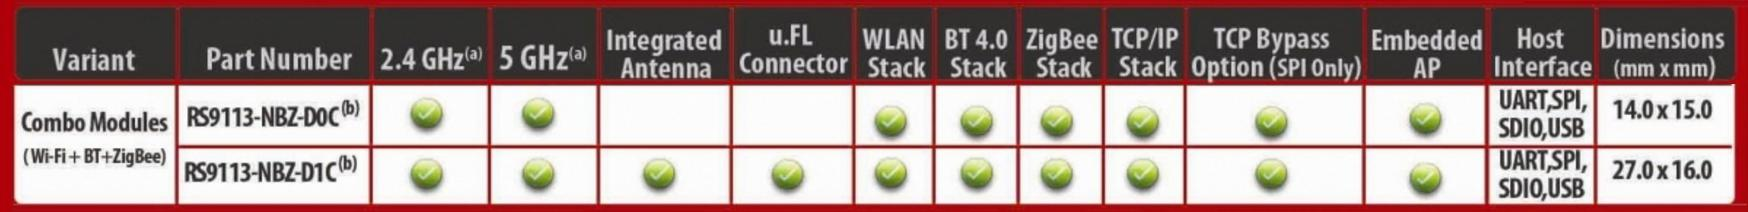 Combo-решения Wi-Fi / Bluetooth Компании Redpine Signals